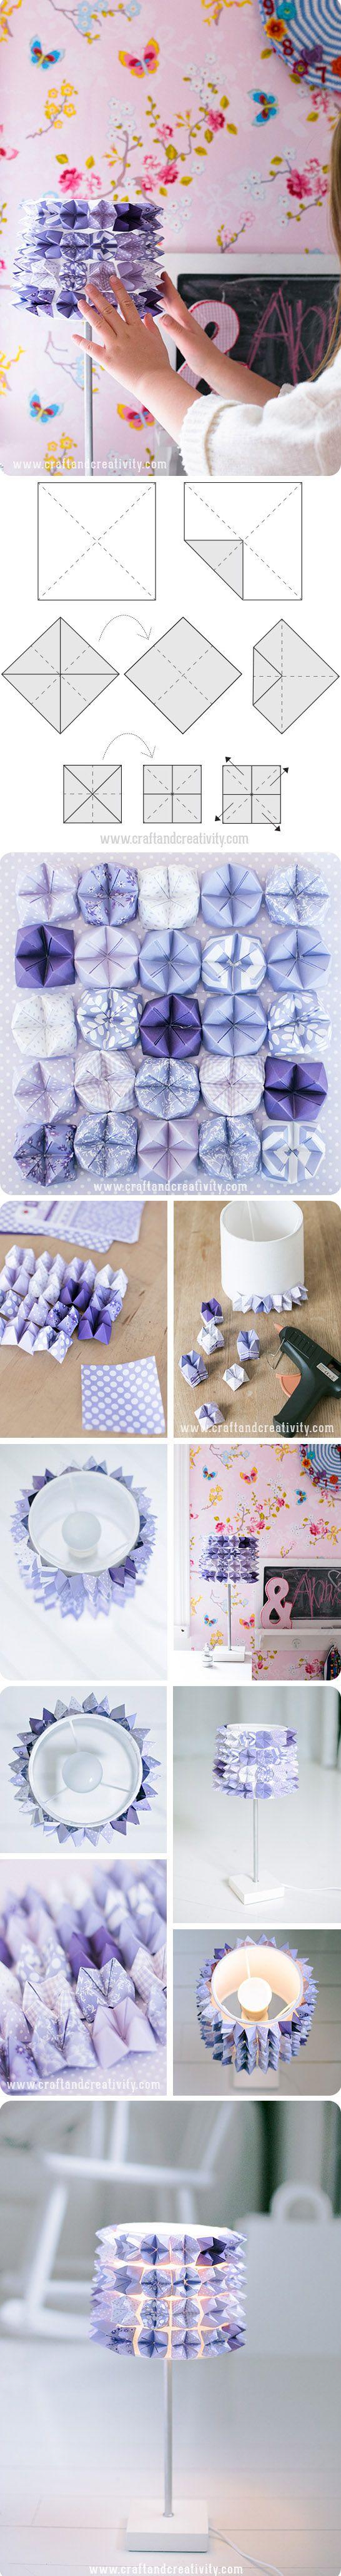 lampara-DIY-4-papel-plegado-muy-ingenioso-1